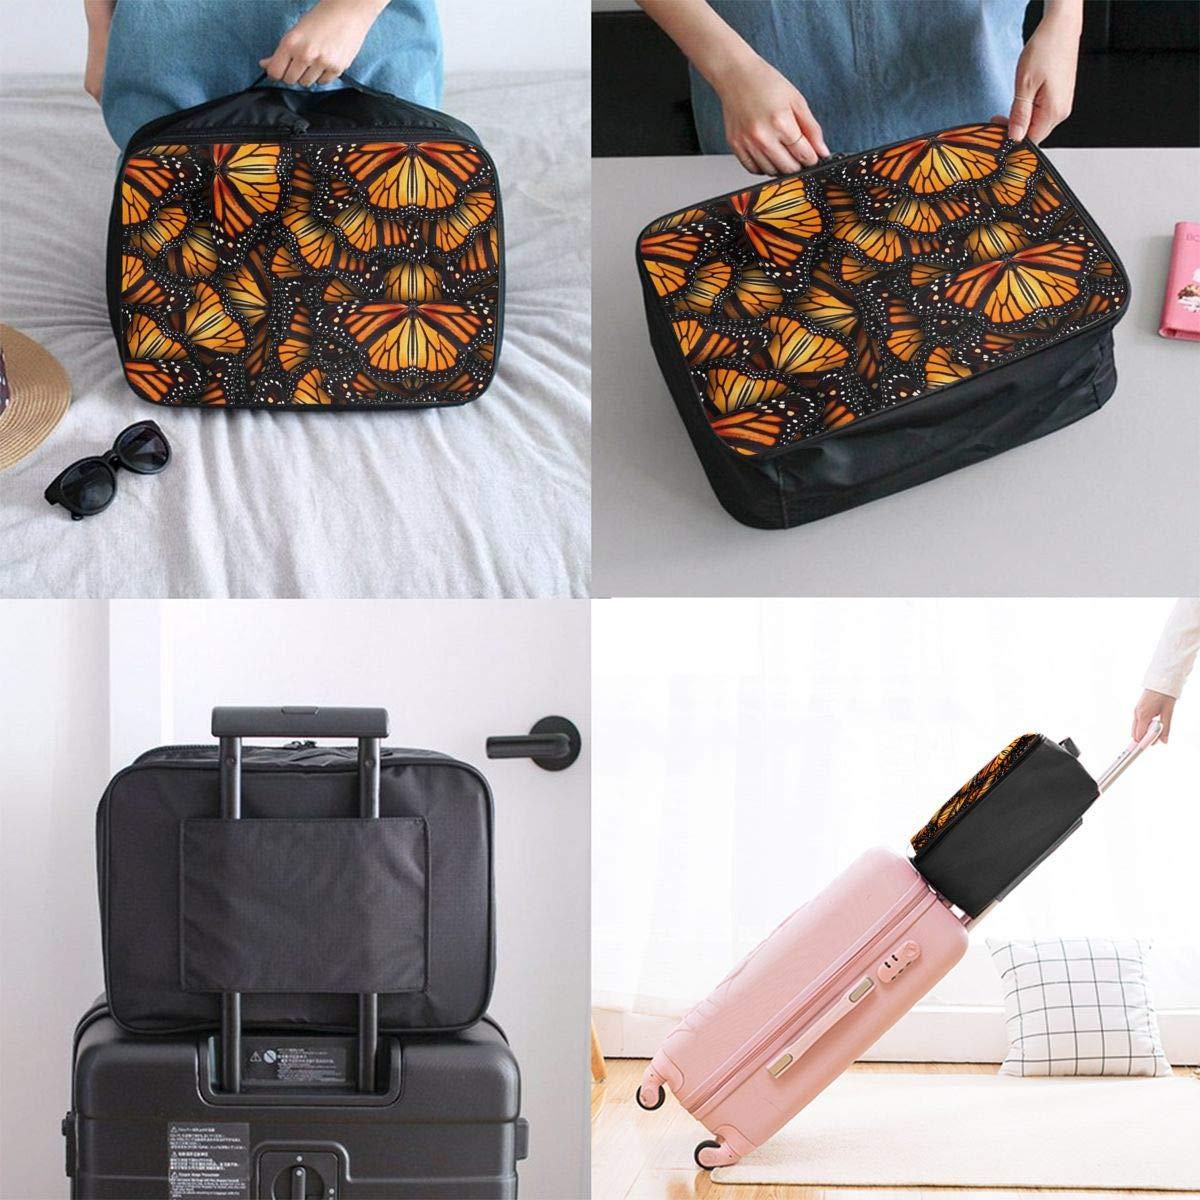 Heaps Of Orange Monarch Butterflies Travel Duffel Bag Waterproof Fashion Lightweight Large Capacity Portable Luggage Bag